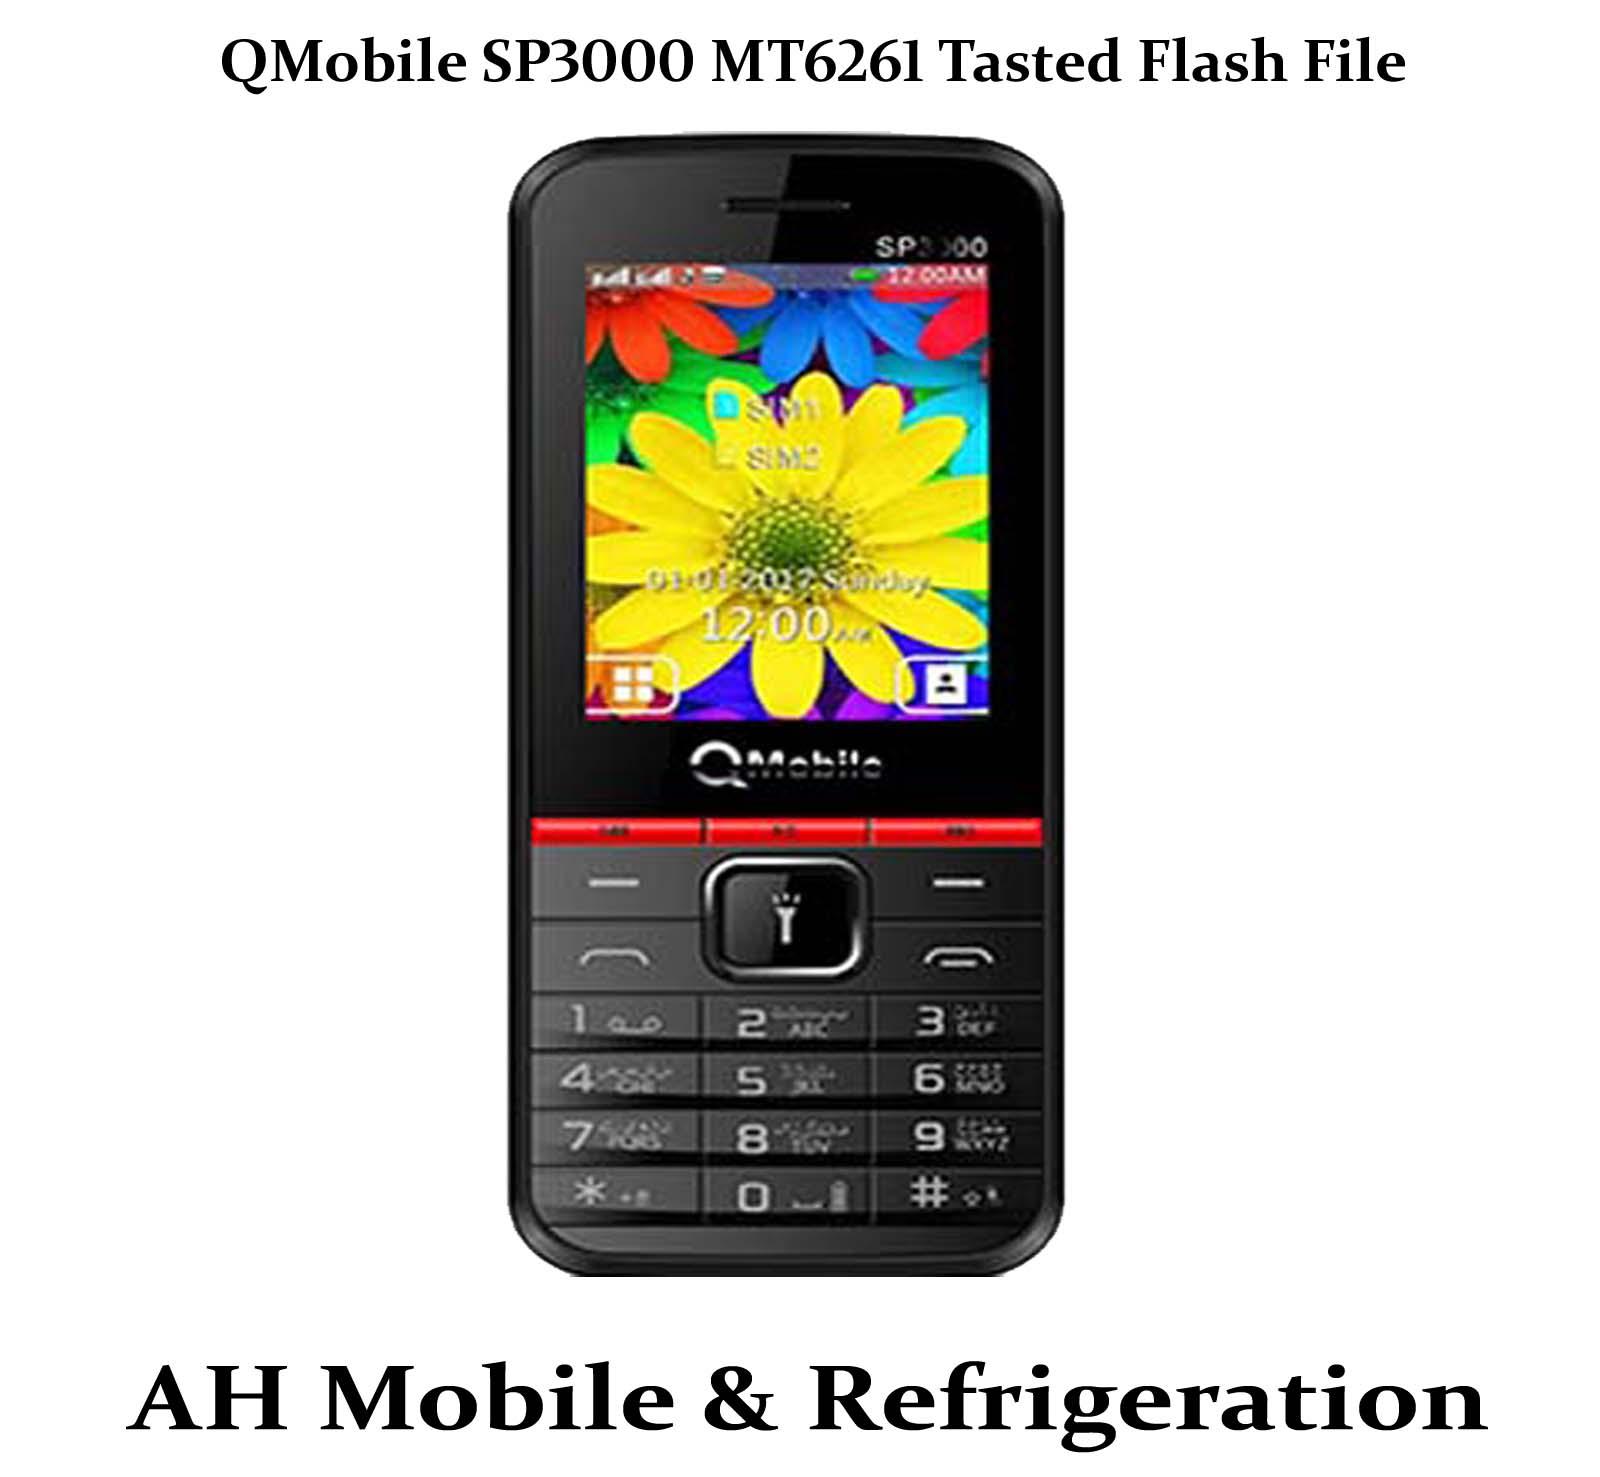 QMobile SP3000 MT6261 Flash File 100% Tasted File - AH